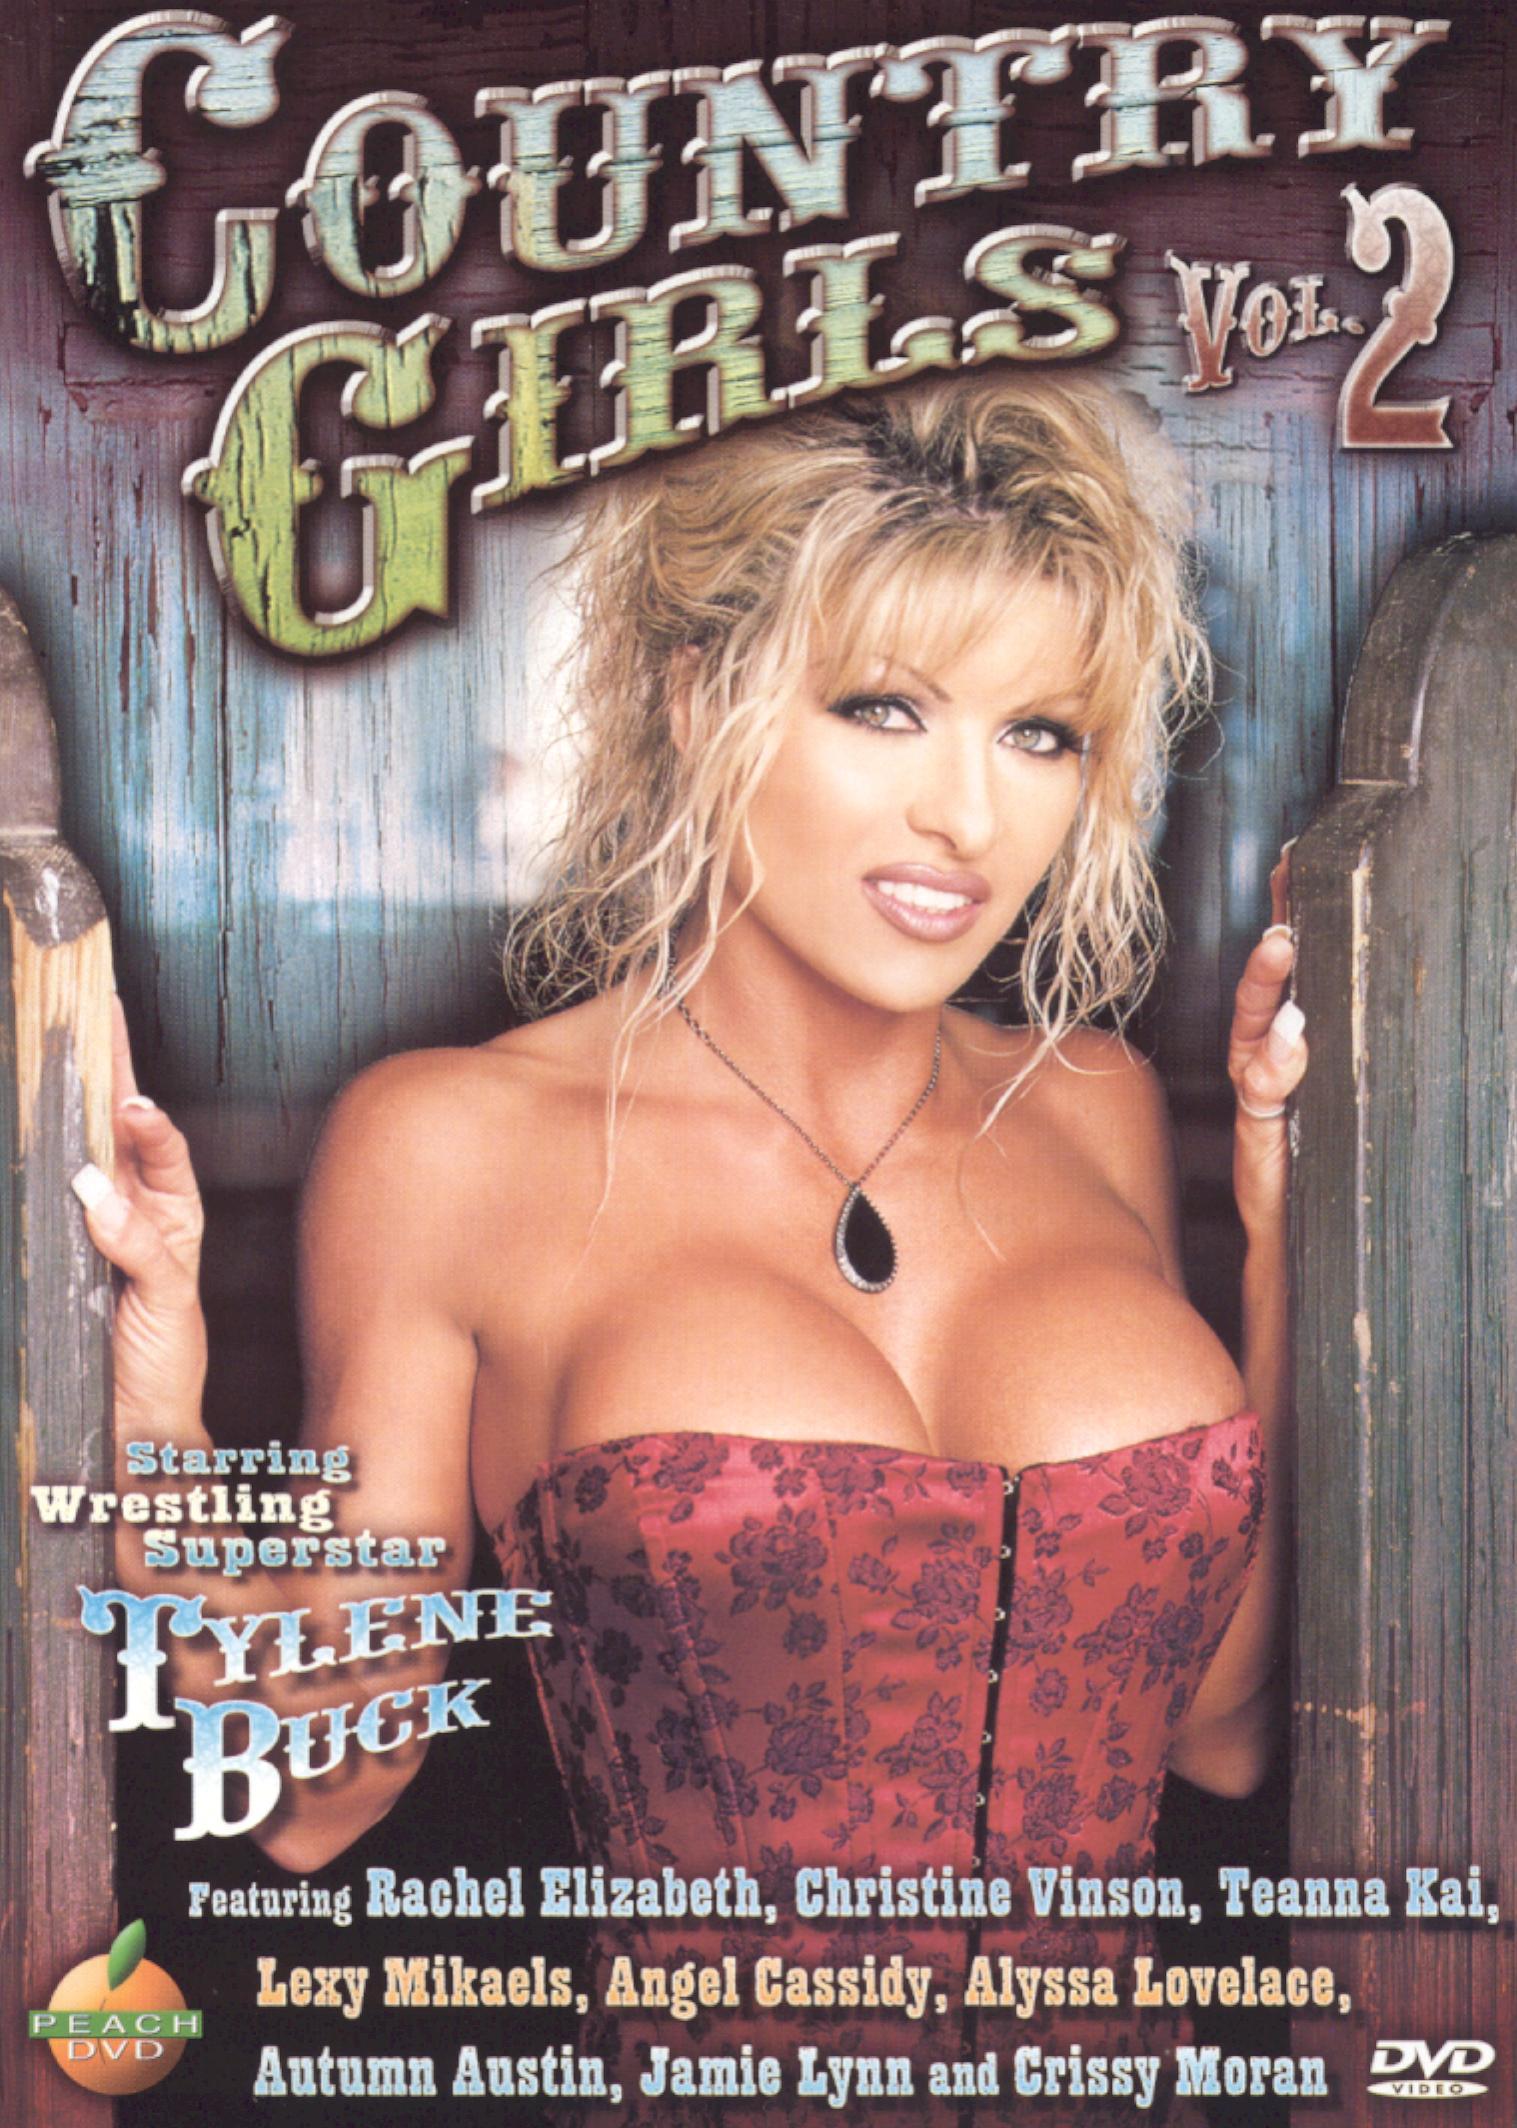 Country Girls, Vol. 2